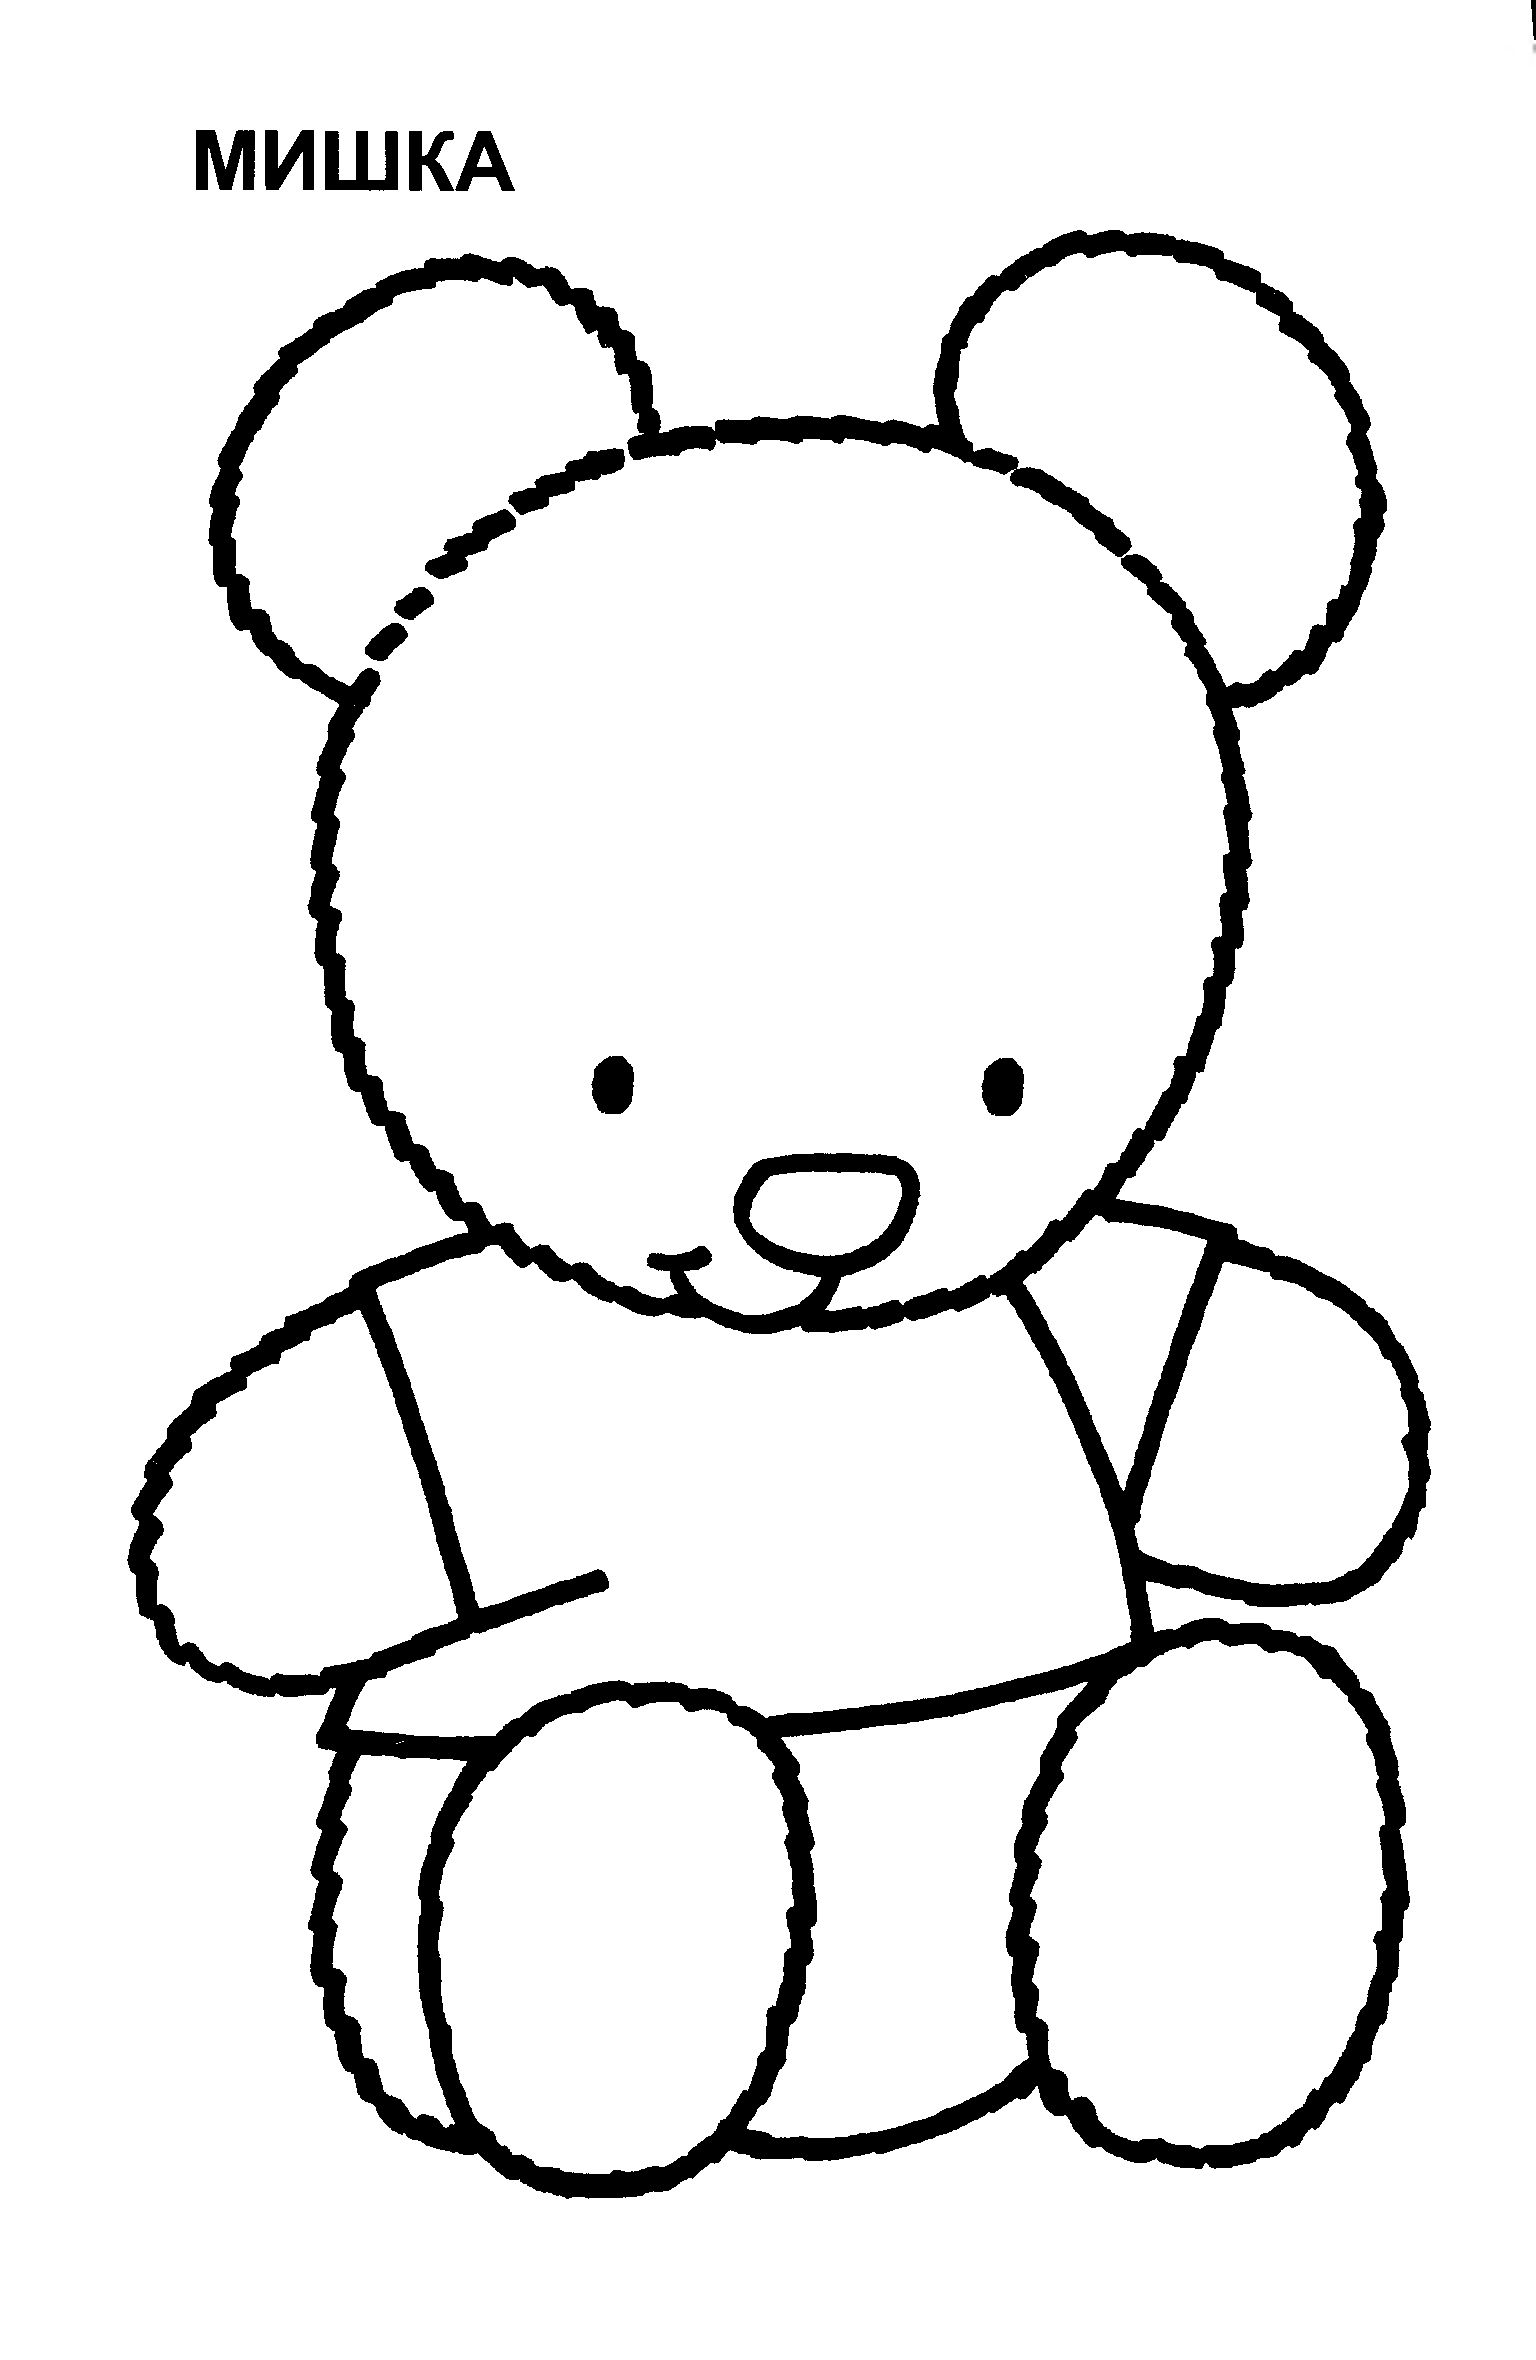 Раскраска для малышей 2 года онлайн - 8